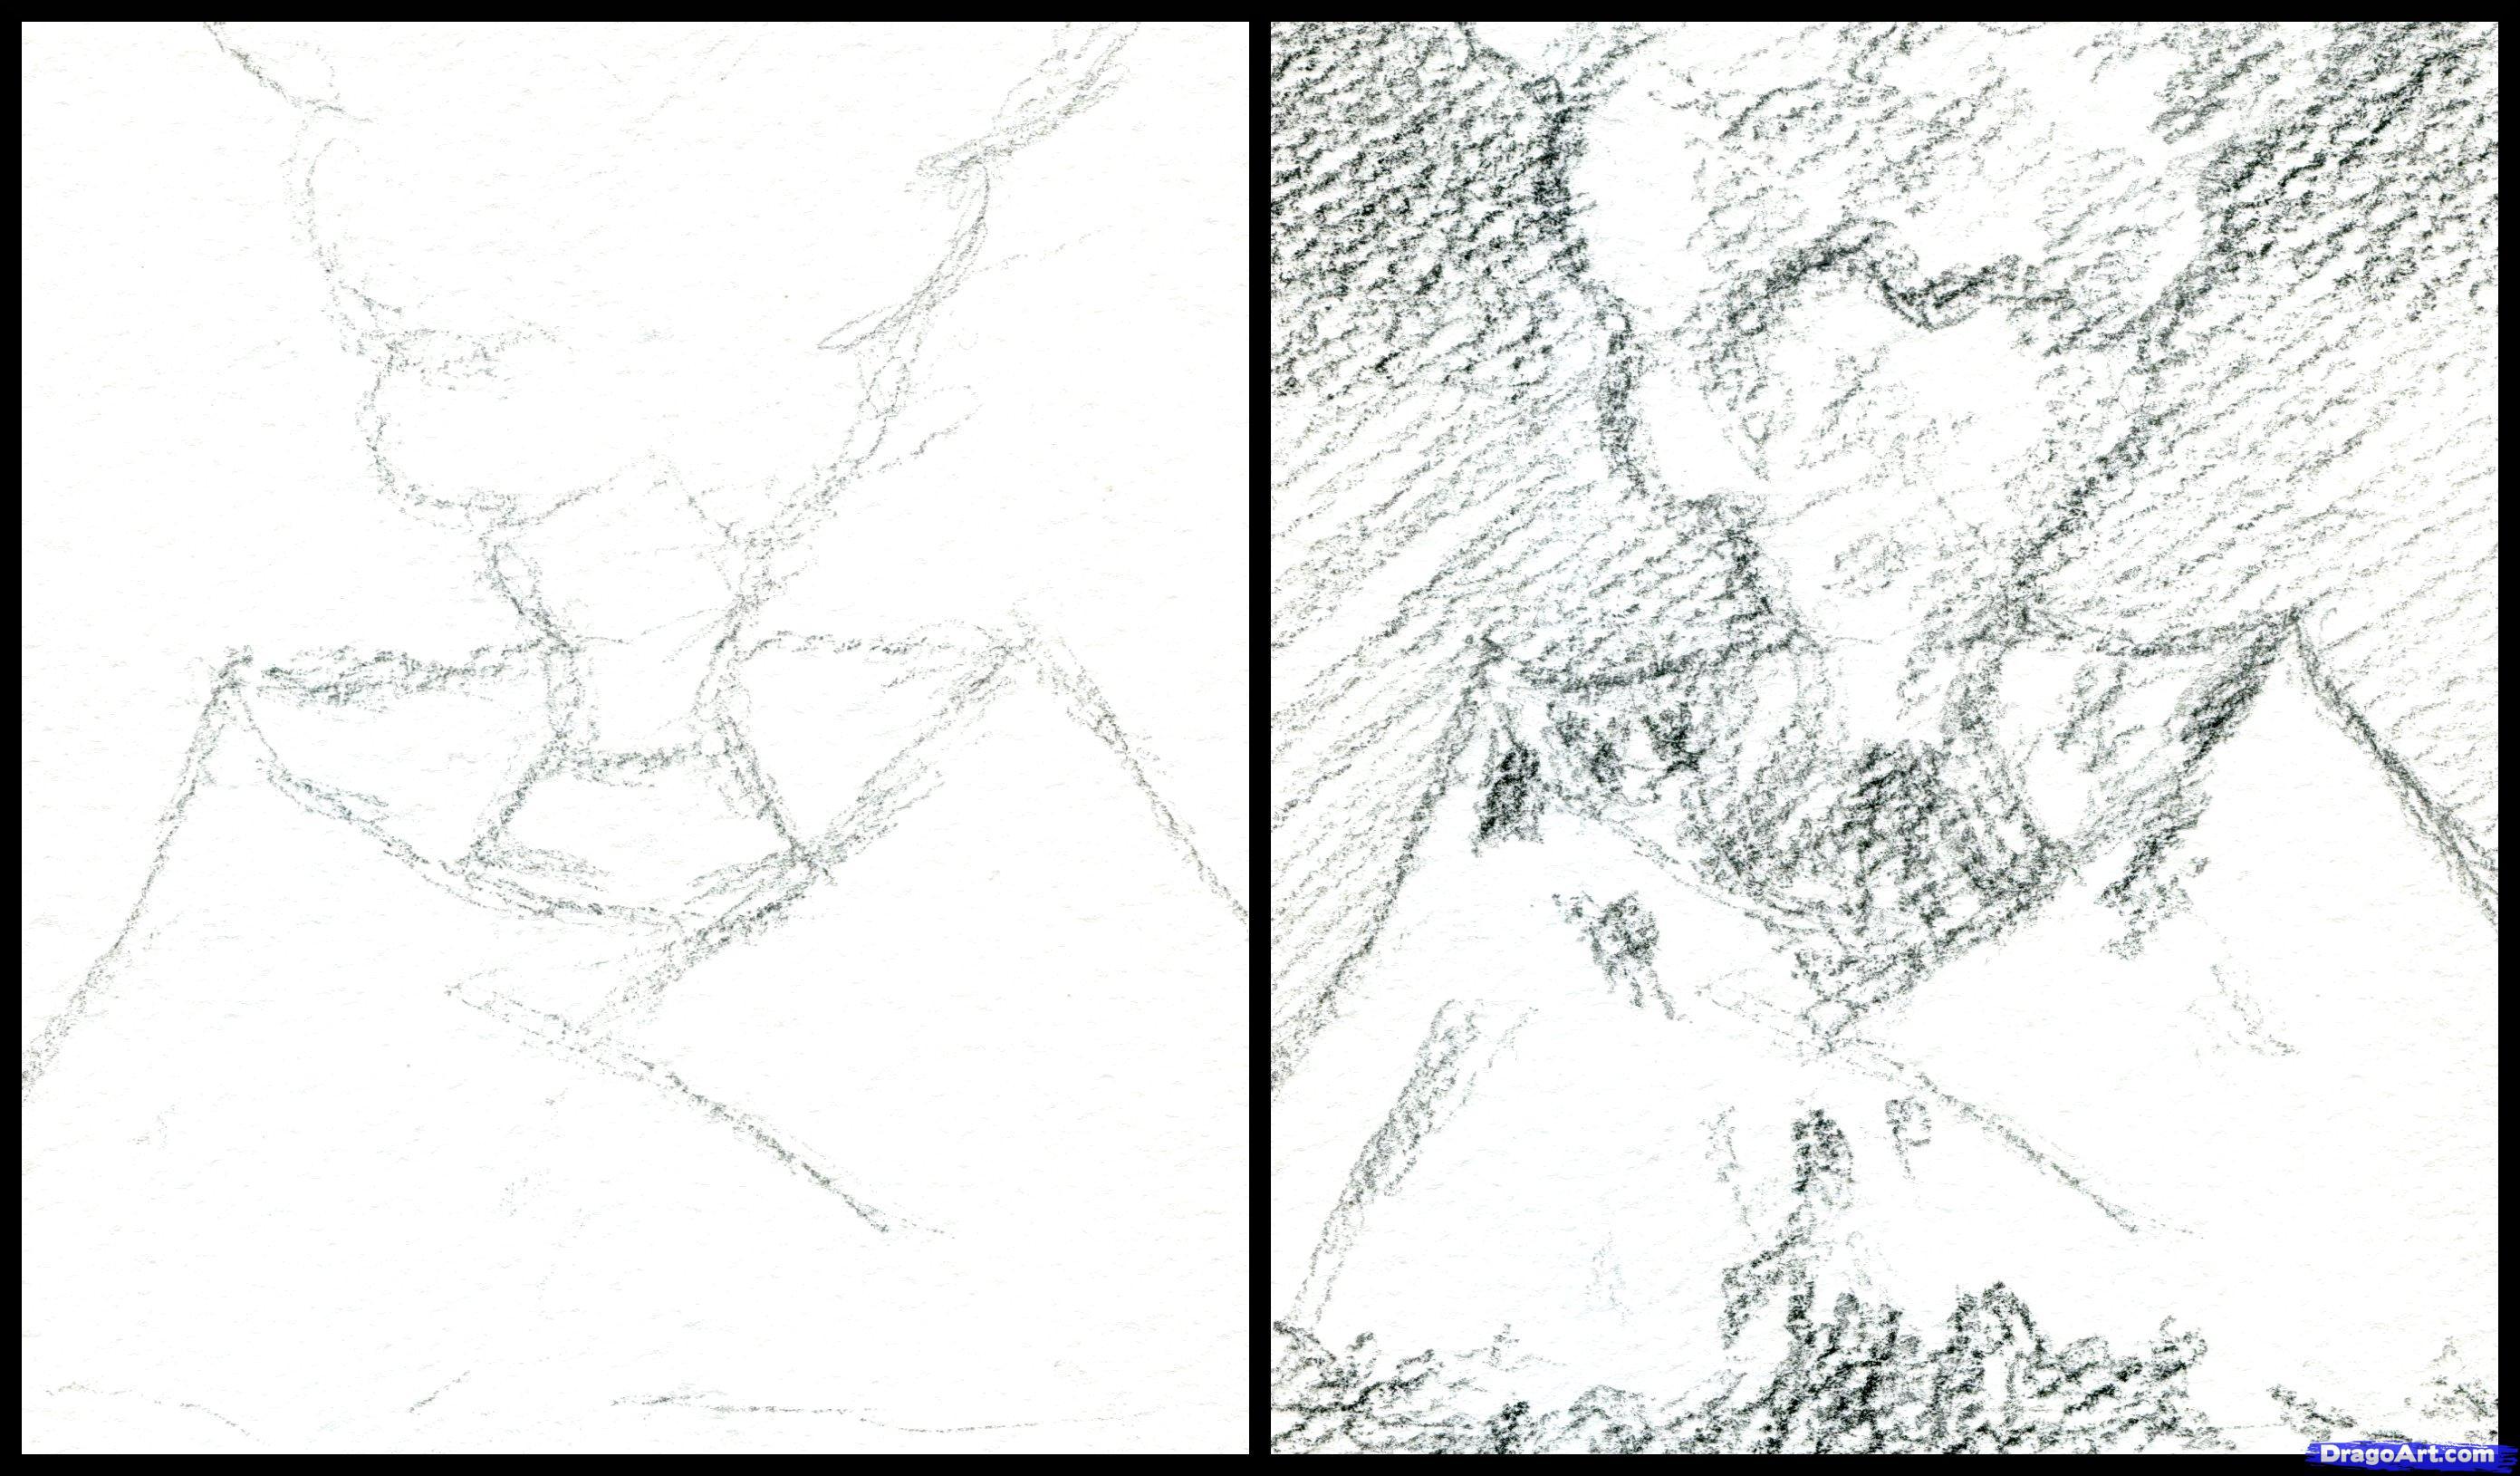 2782x1629 Drawn Volcano Pencil Drawing